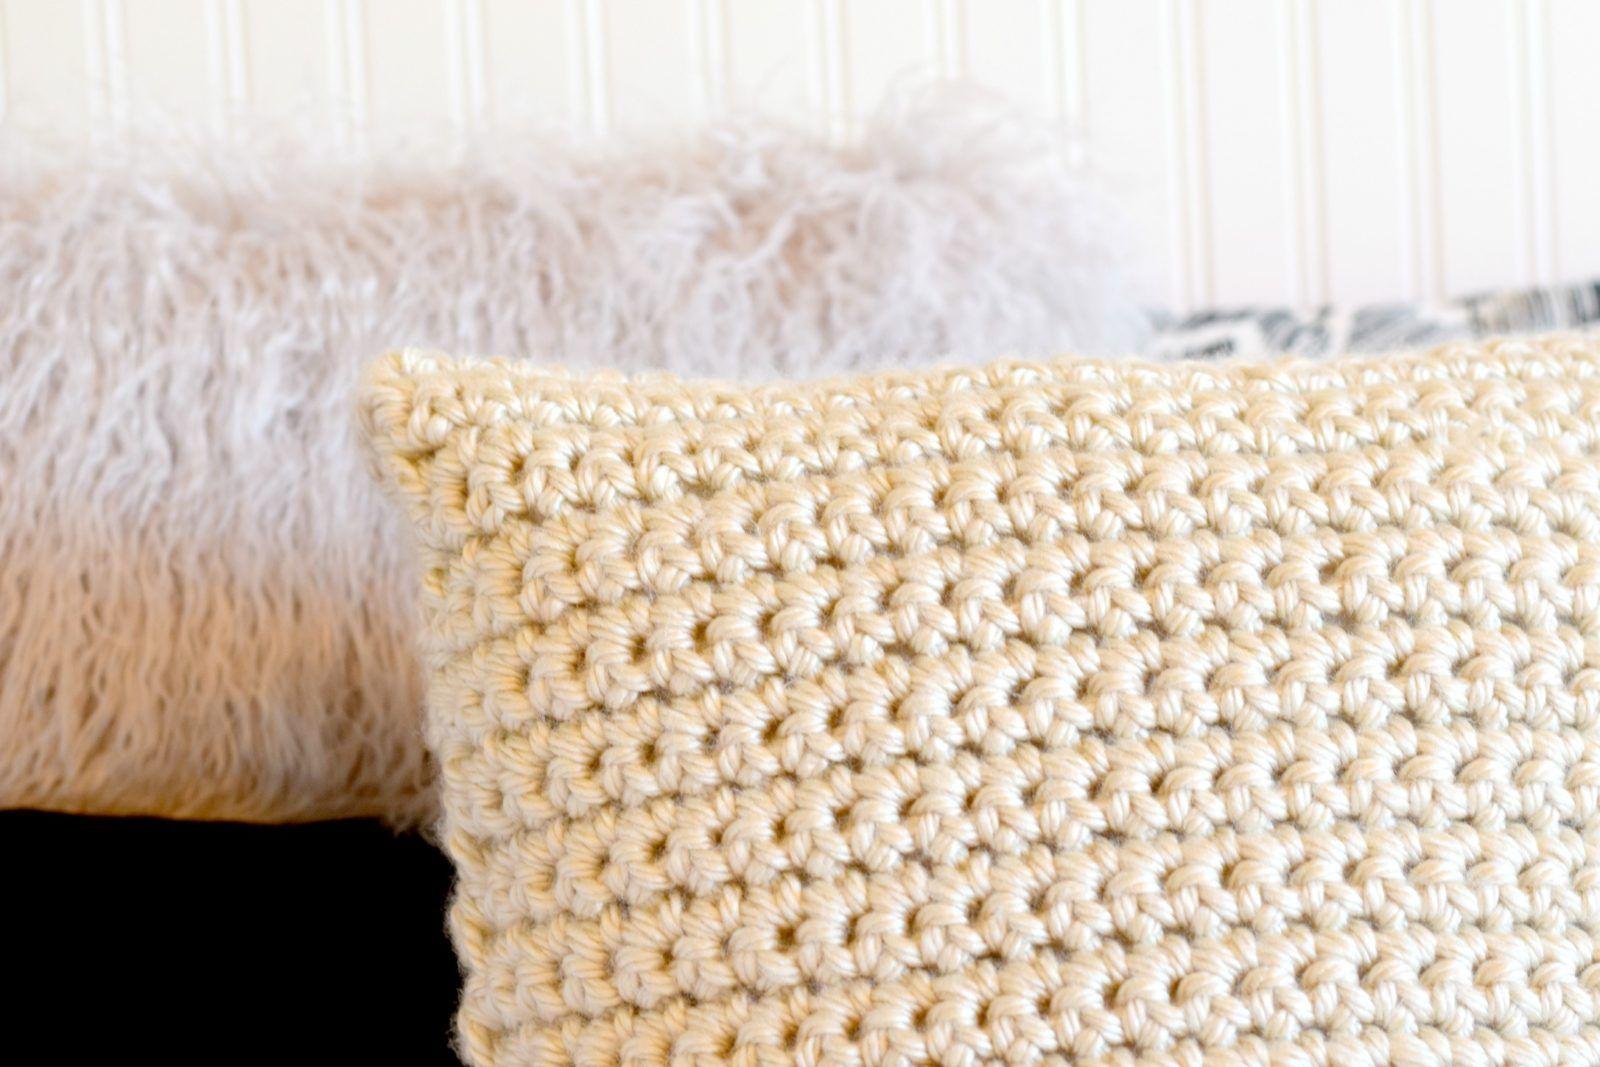 crochet-chunky-pillow-pattern-1 | Crochet I may try someday ...